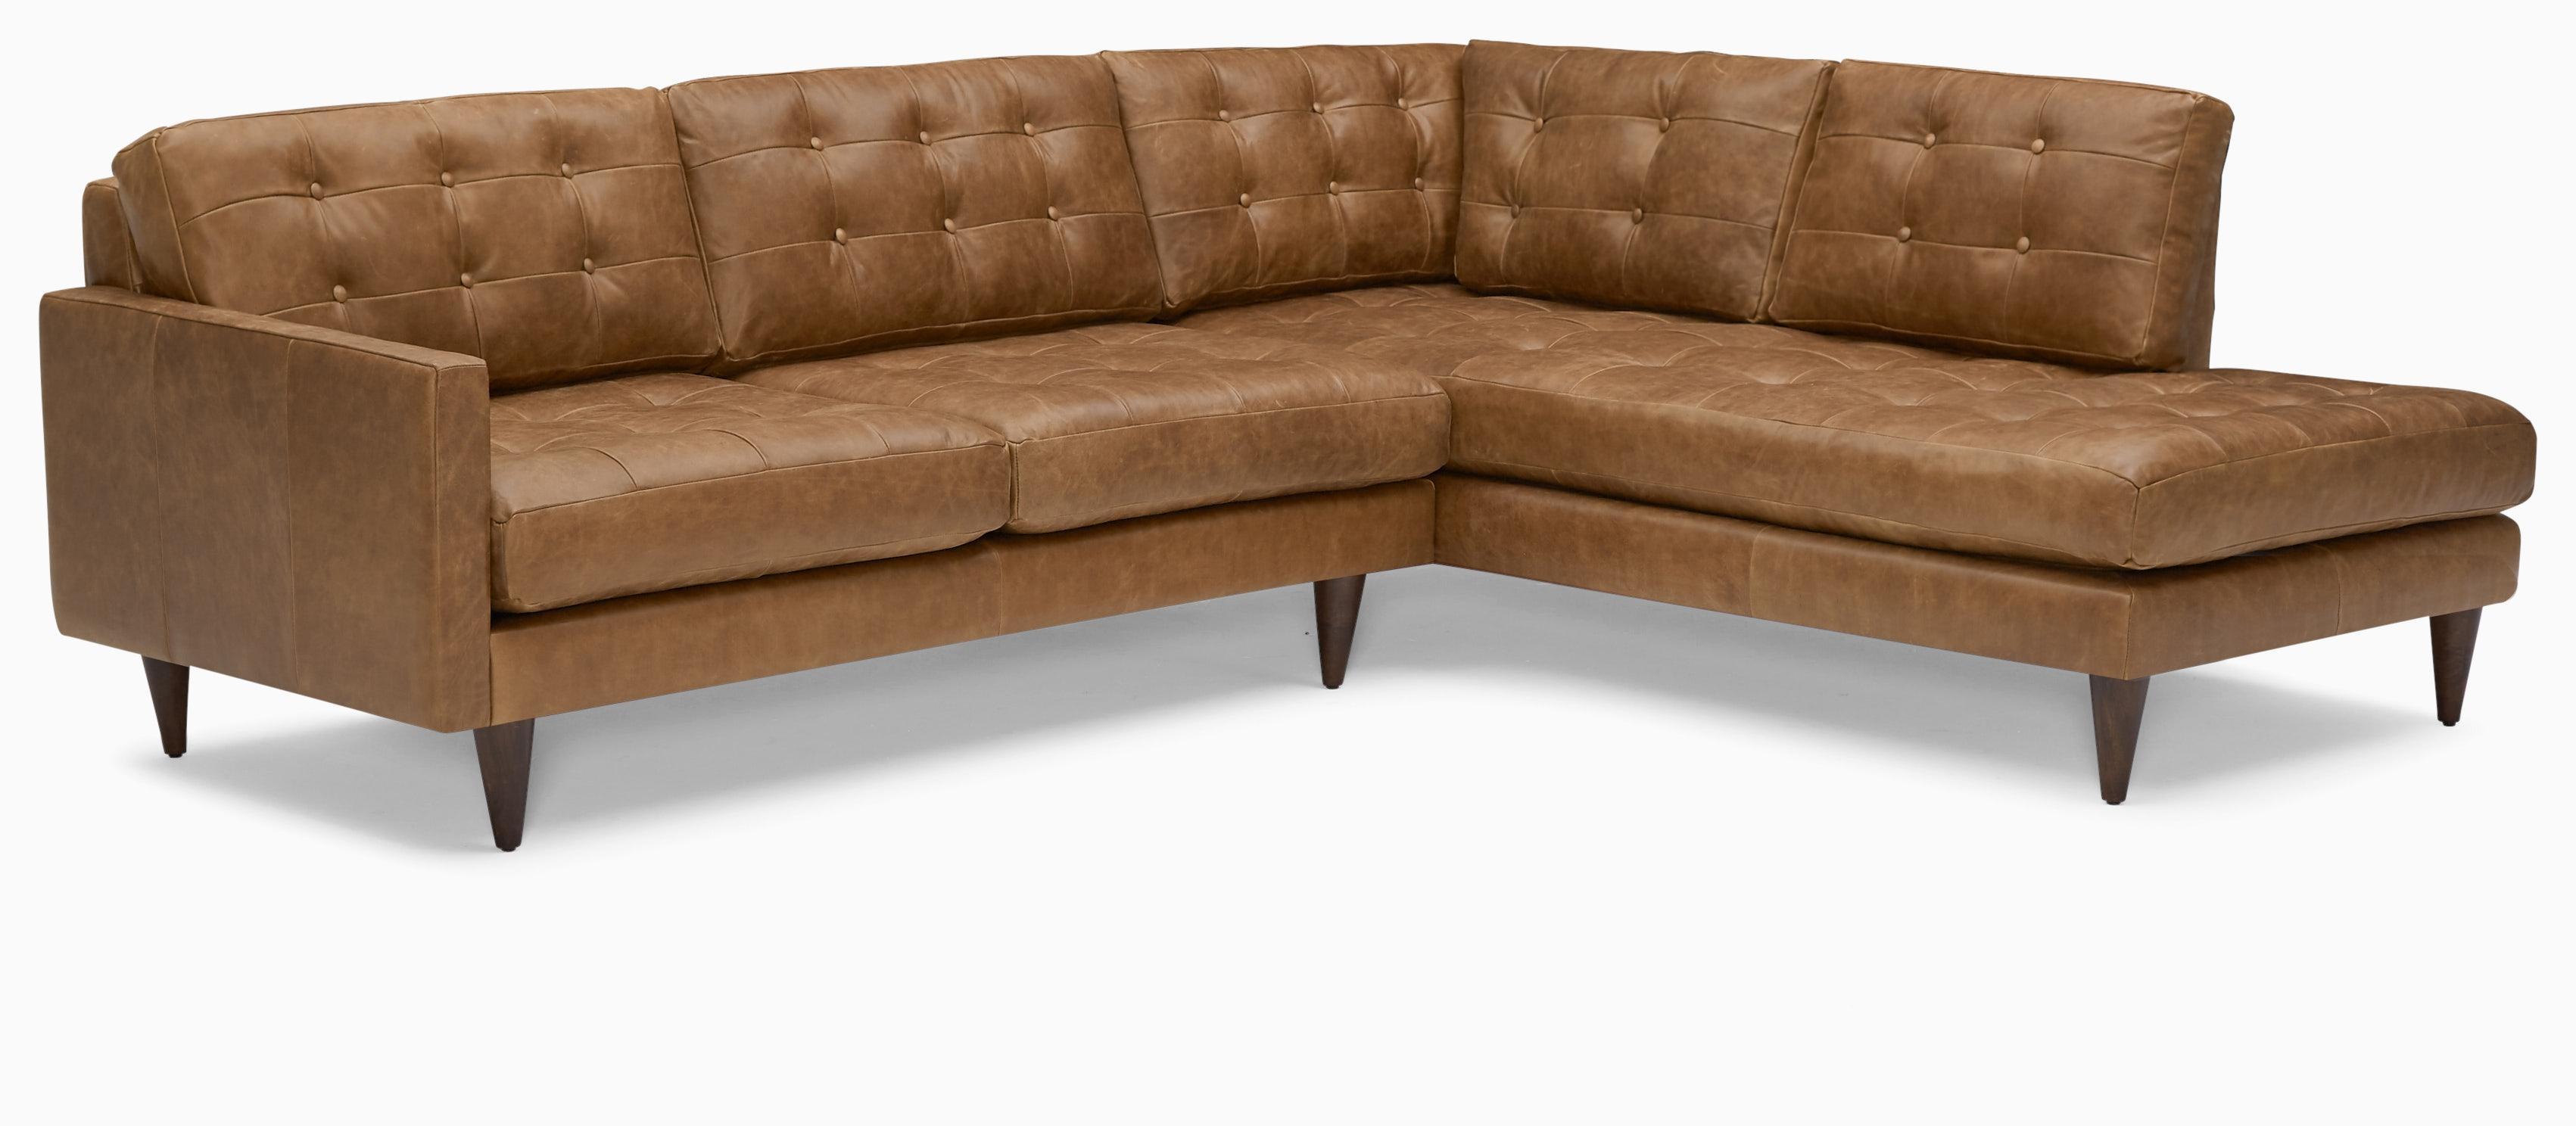 eliot leather sectional with bumper %282 piece%29 santiago ale